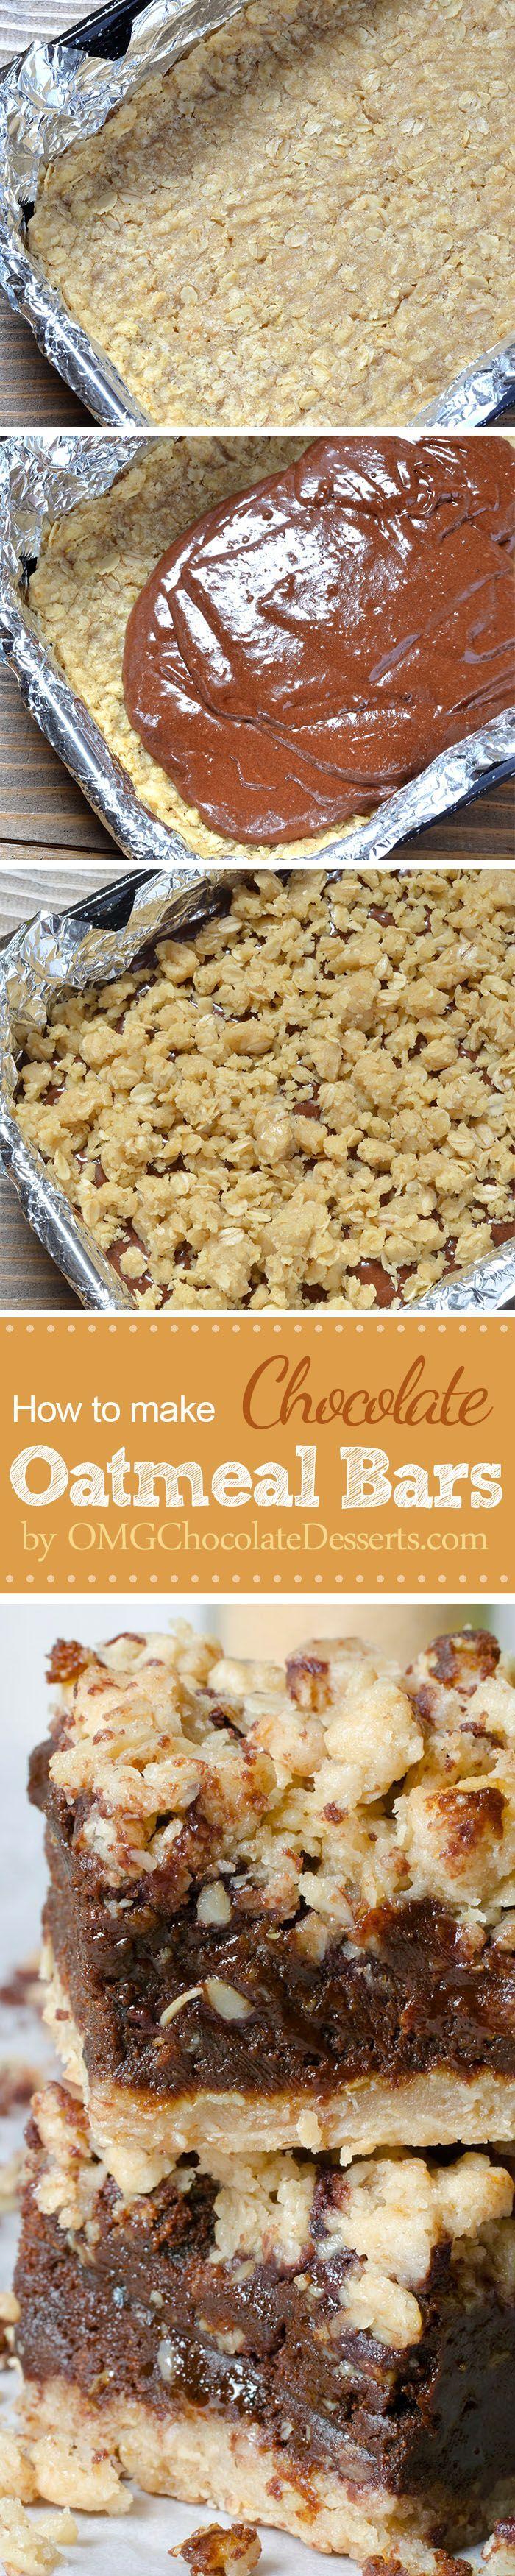 Chocolate Oatmeal Bars | OMGChocolateDesserts.com | #oatmeal #chocolate #bars: